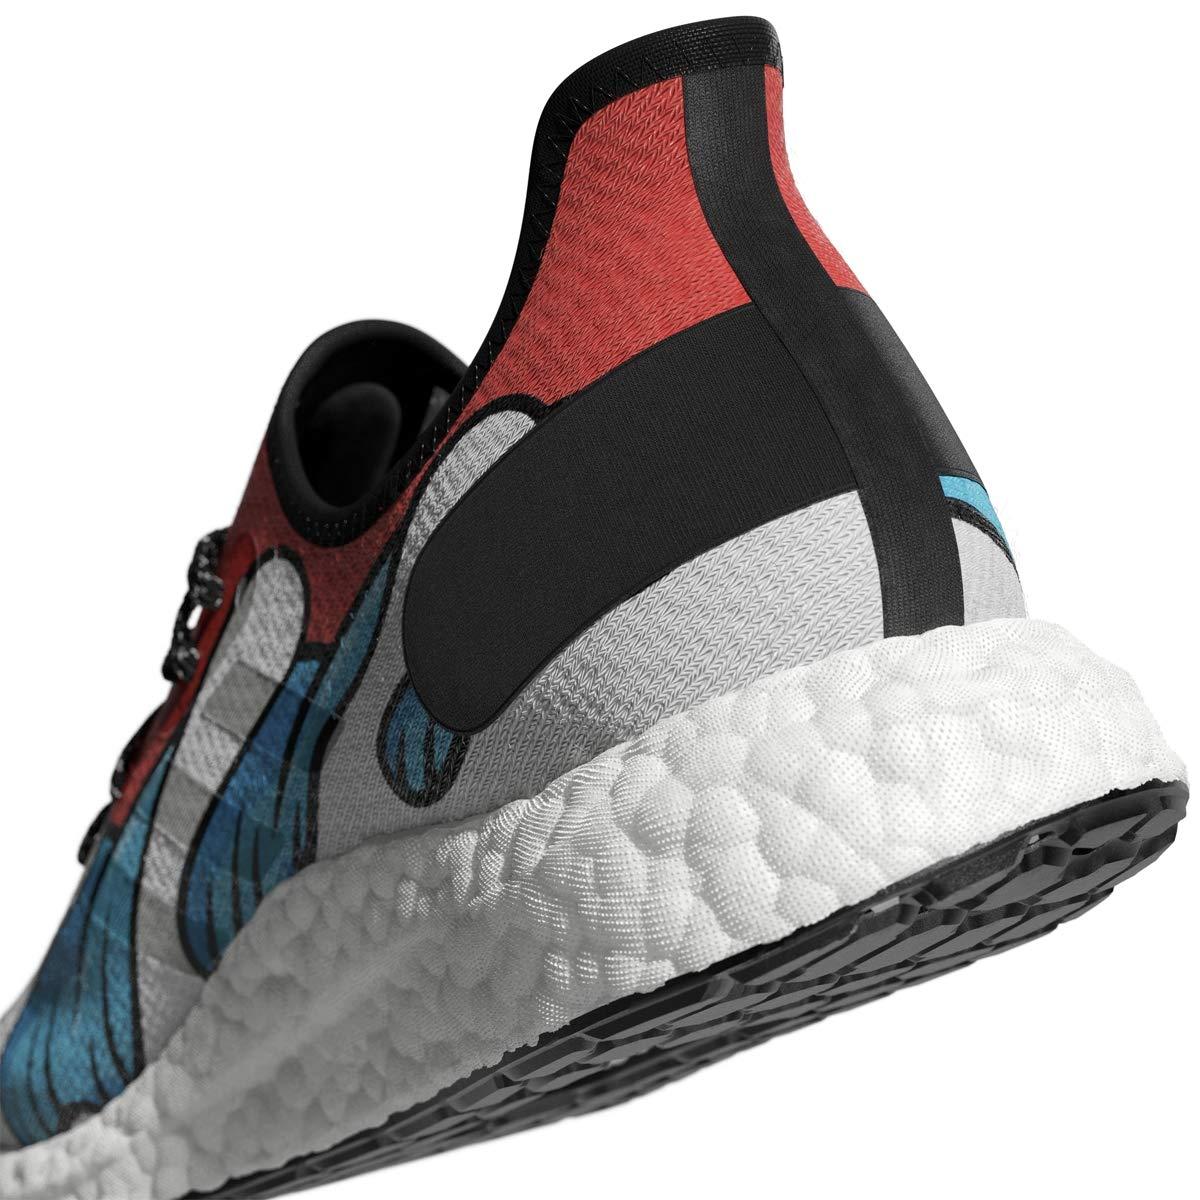 ef4a00ea Amazon.com | adidas SPEEDFACTORY AM4 L.A. Aaron Kai Shoe - Men's Running |  Running